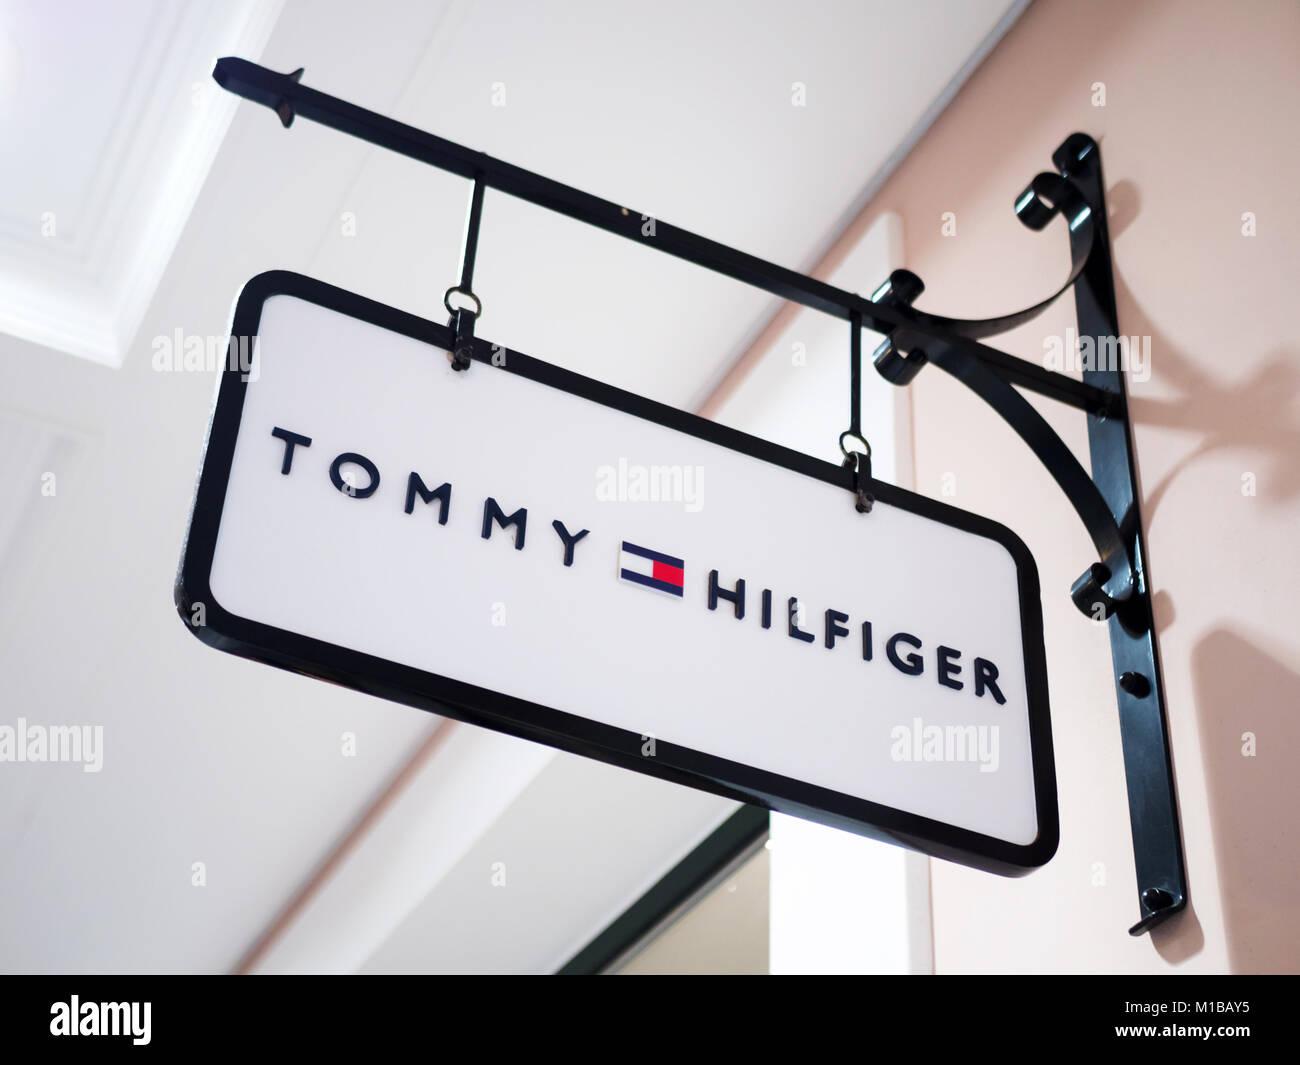 huge selection of d110e c687f Athen, Griechenland - 30. Dezember 2016: Tommy Hilfiger Shop ...